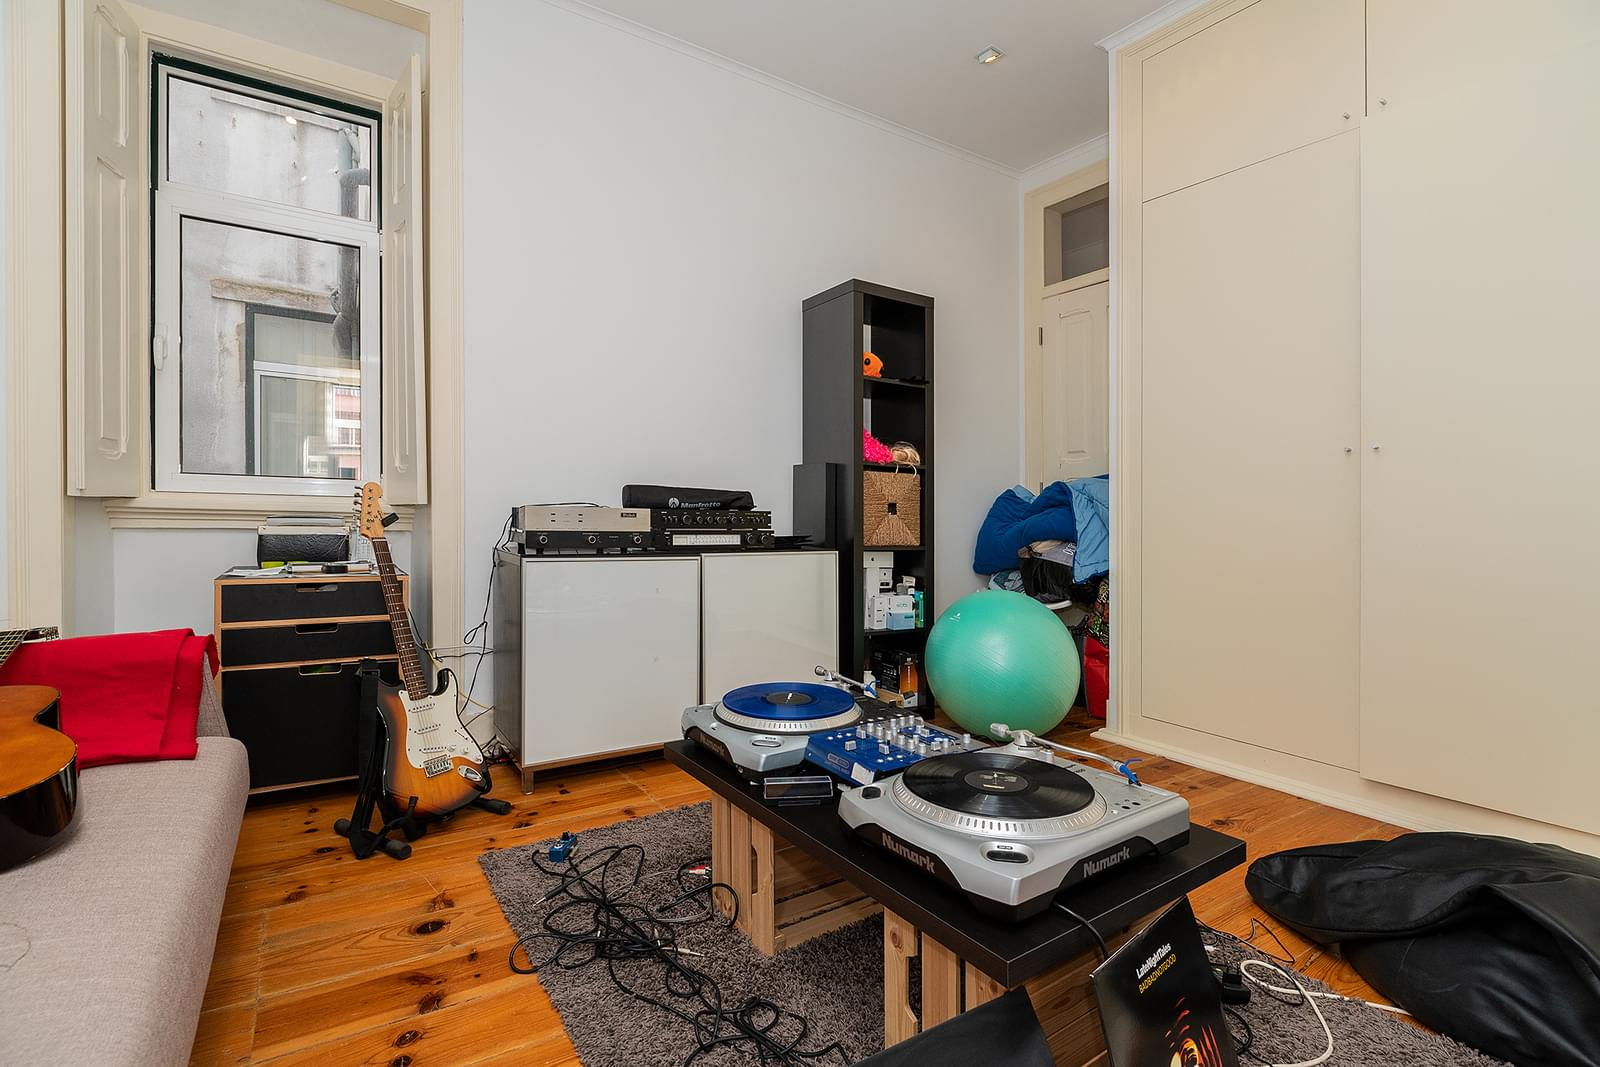 pf18211-apartamento-t2-1-lisboa-c64bfbfc-ede1-4b24-8202-eccf6c19cc42